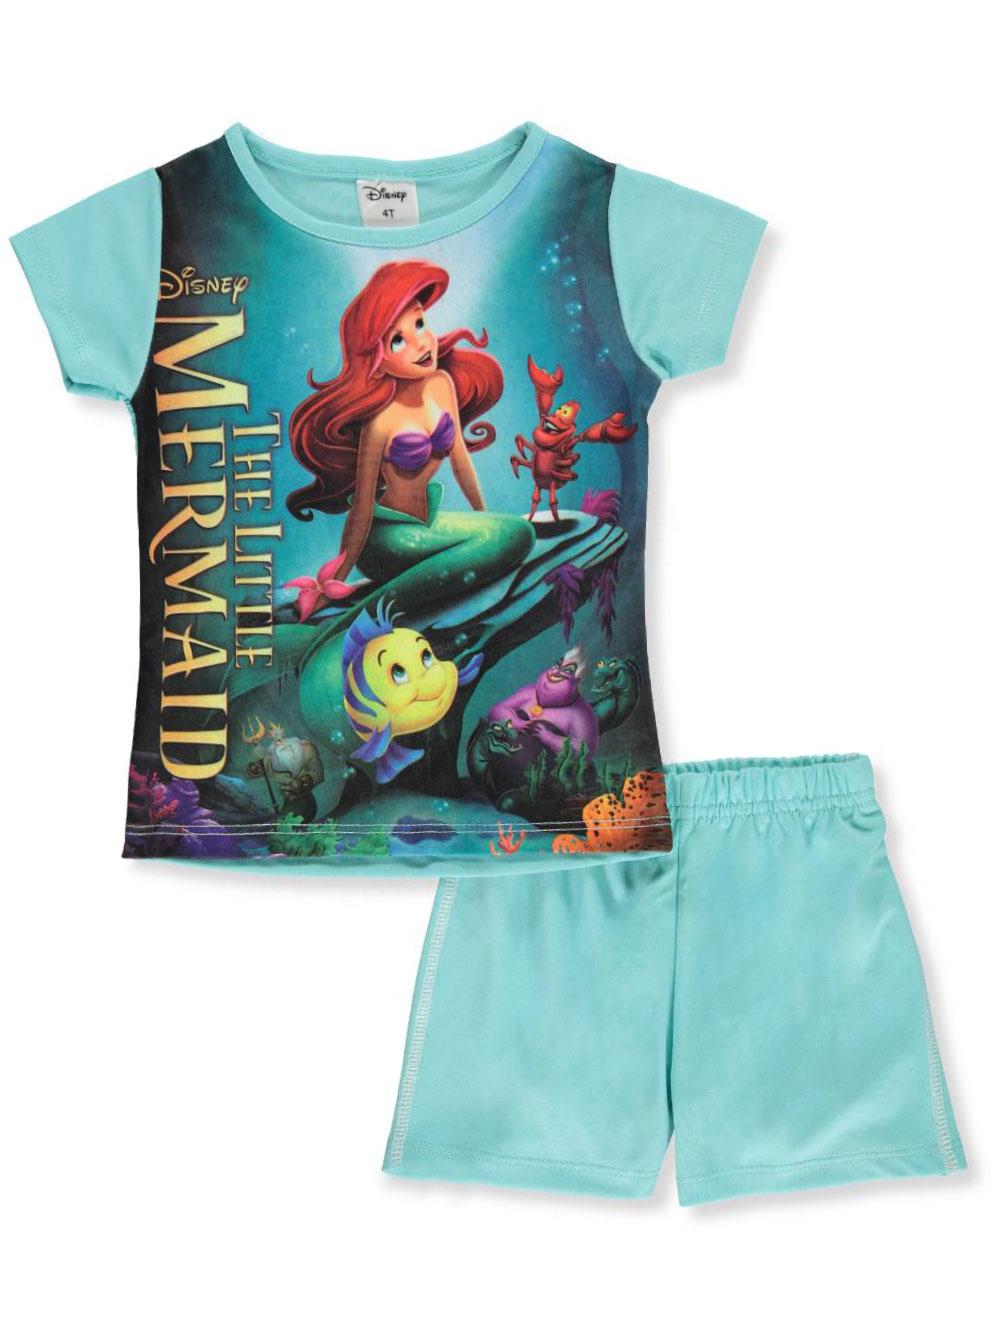 702d2951b6044 Disney The Little Mermaid Girls' 2-Piece Shorts Set Outfit